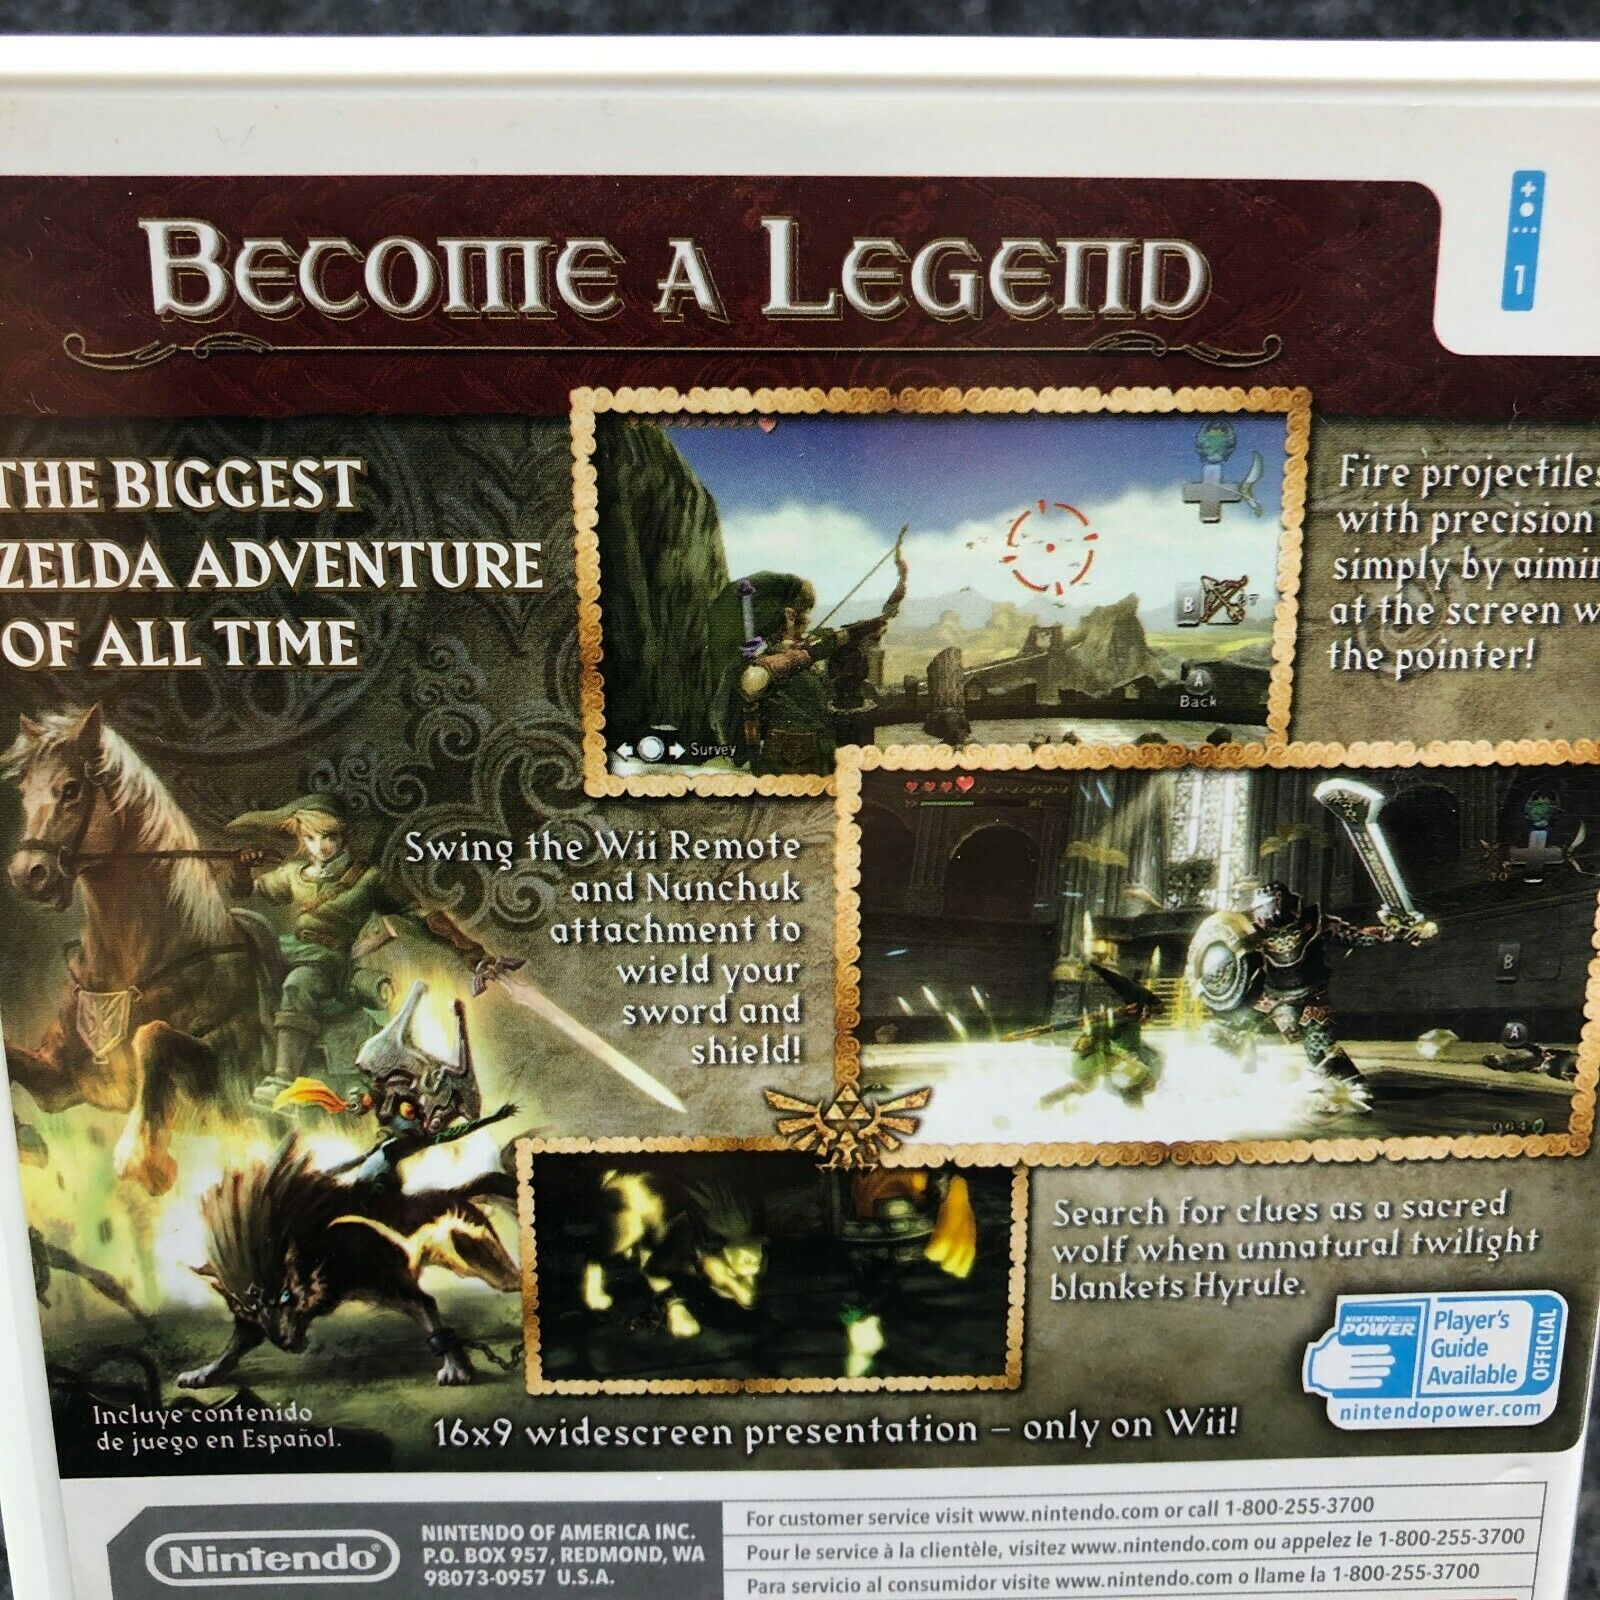 The Legend Of Zelda: Twilight Princess Nintendo Wii, Complete CIB Game image 7